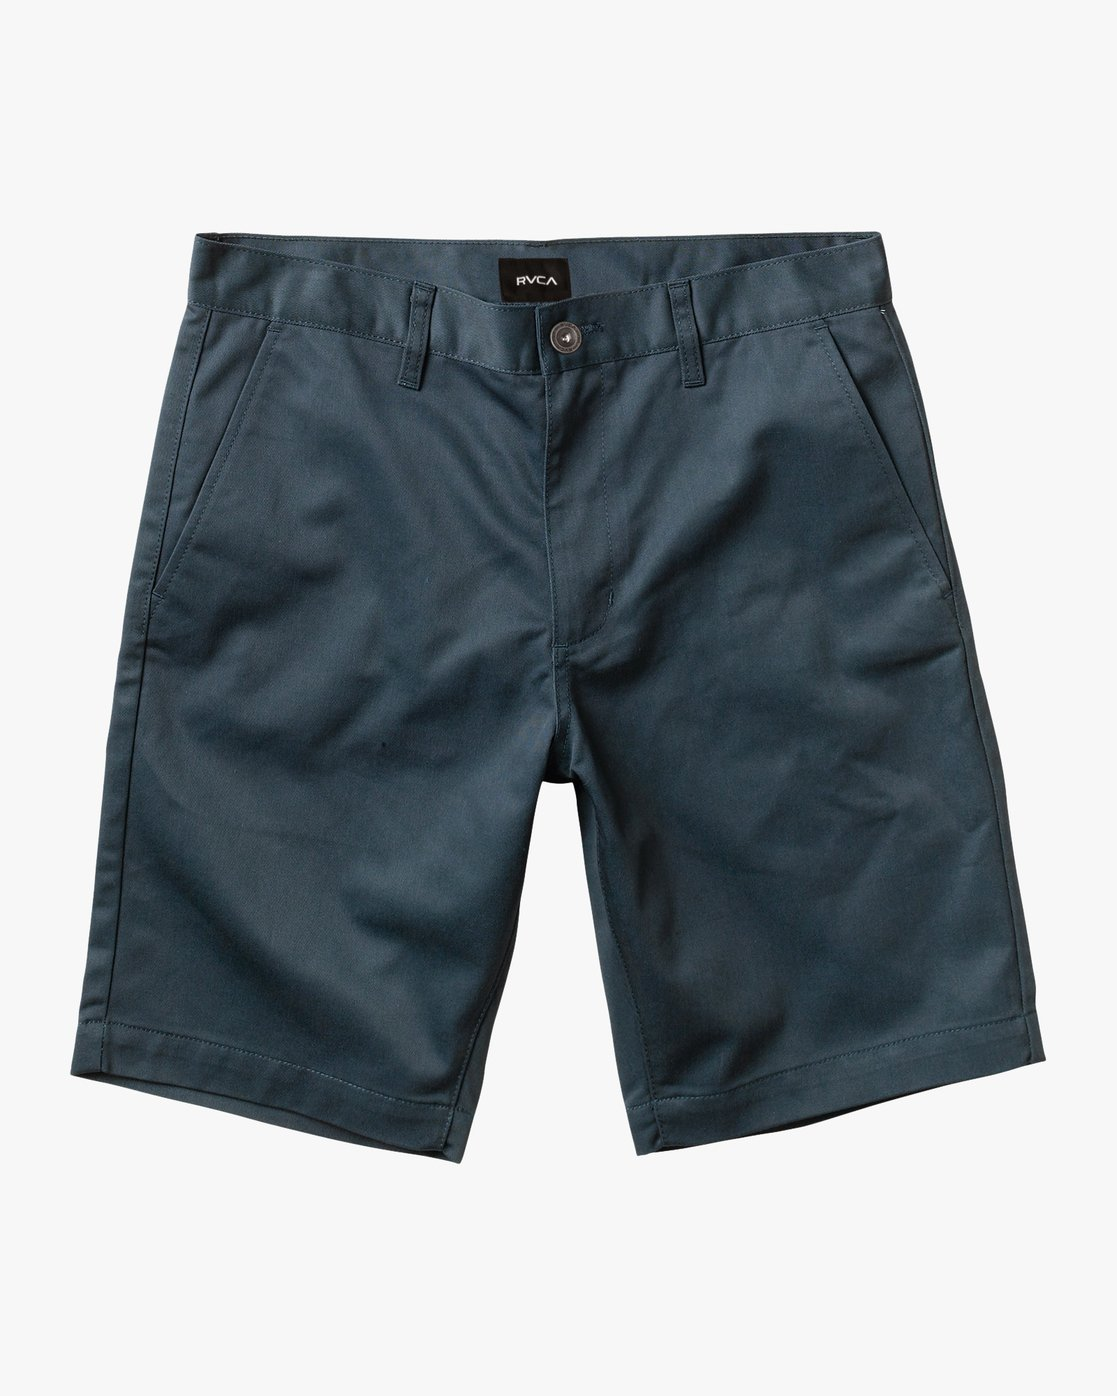 0 Weekend Stretch  - Pantalones cortos elásticos para Hombre Azul H1WKRZRVP8 RVCA